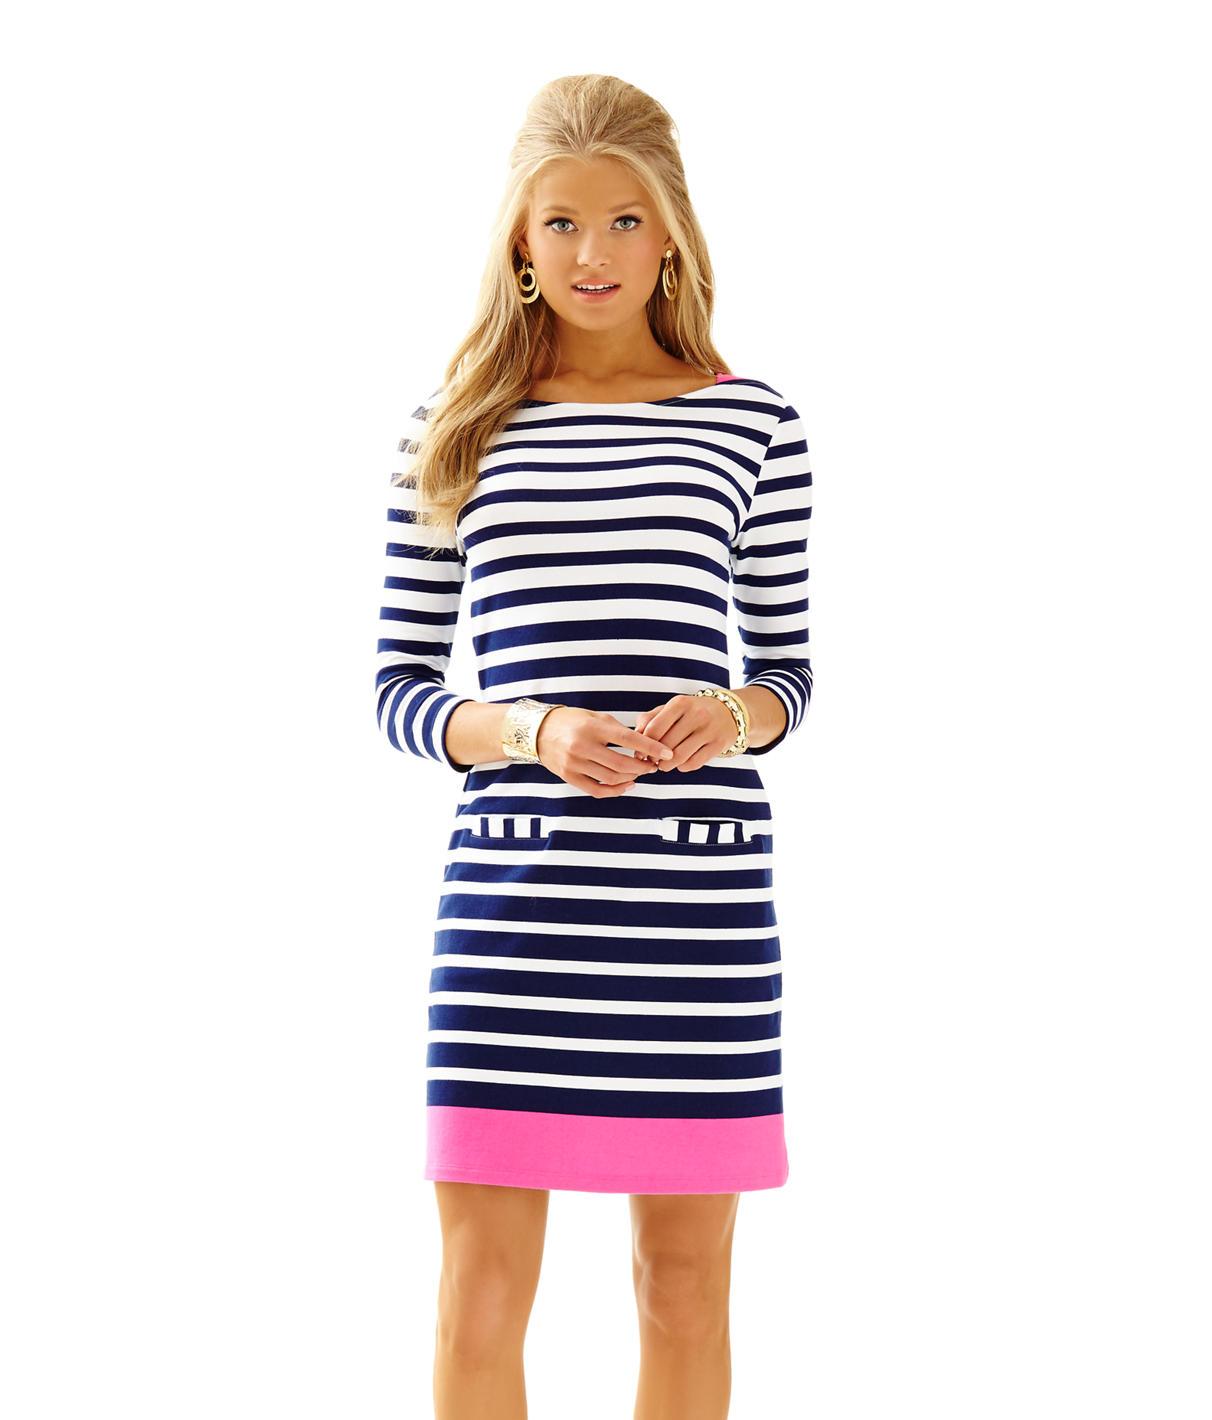 Lilly Pulitzer Irina Shift Dress